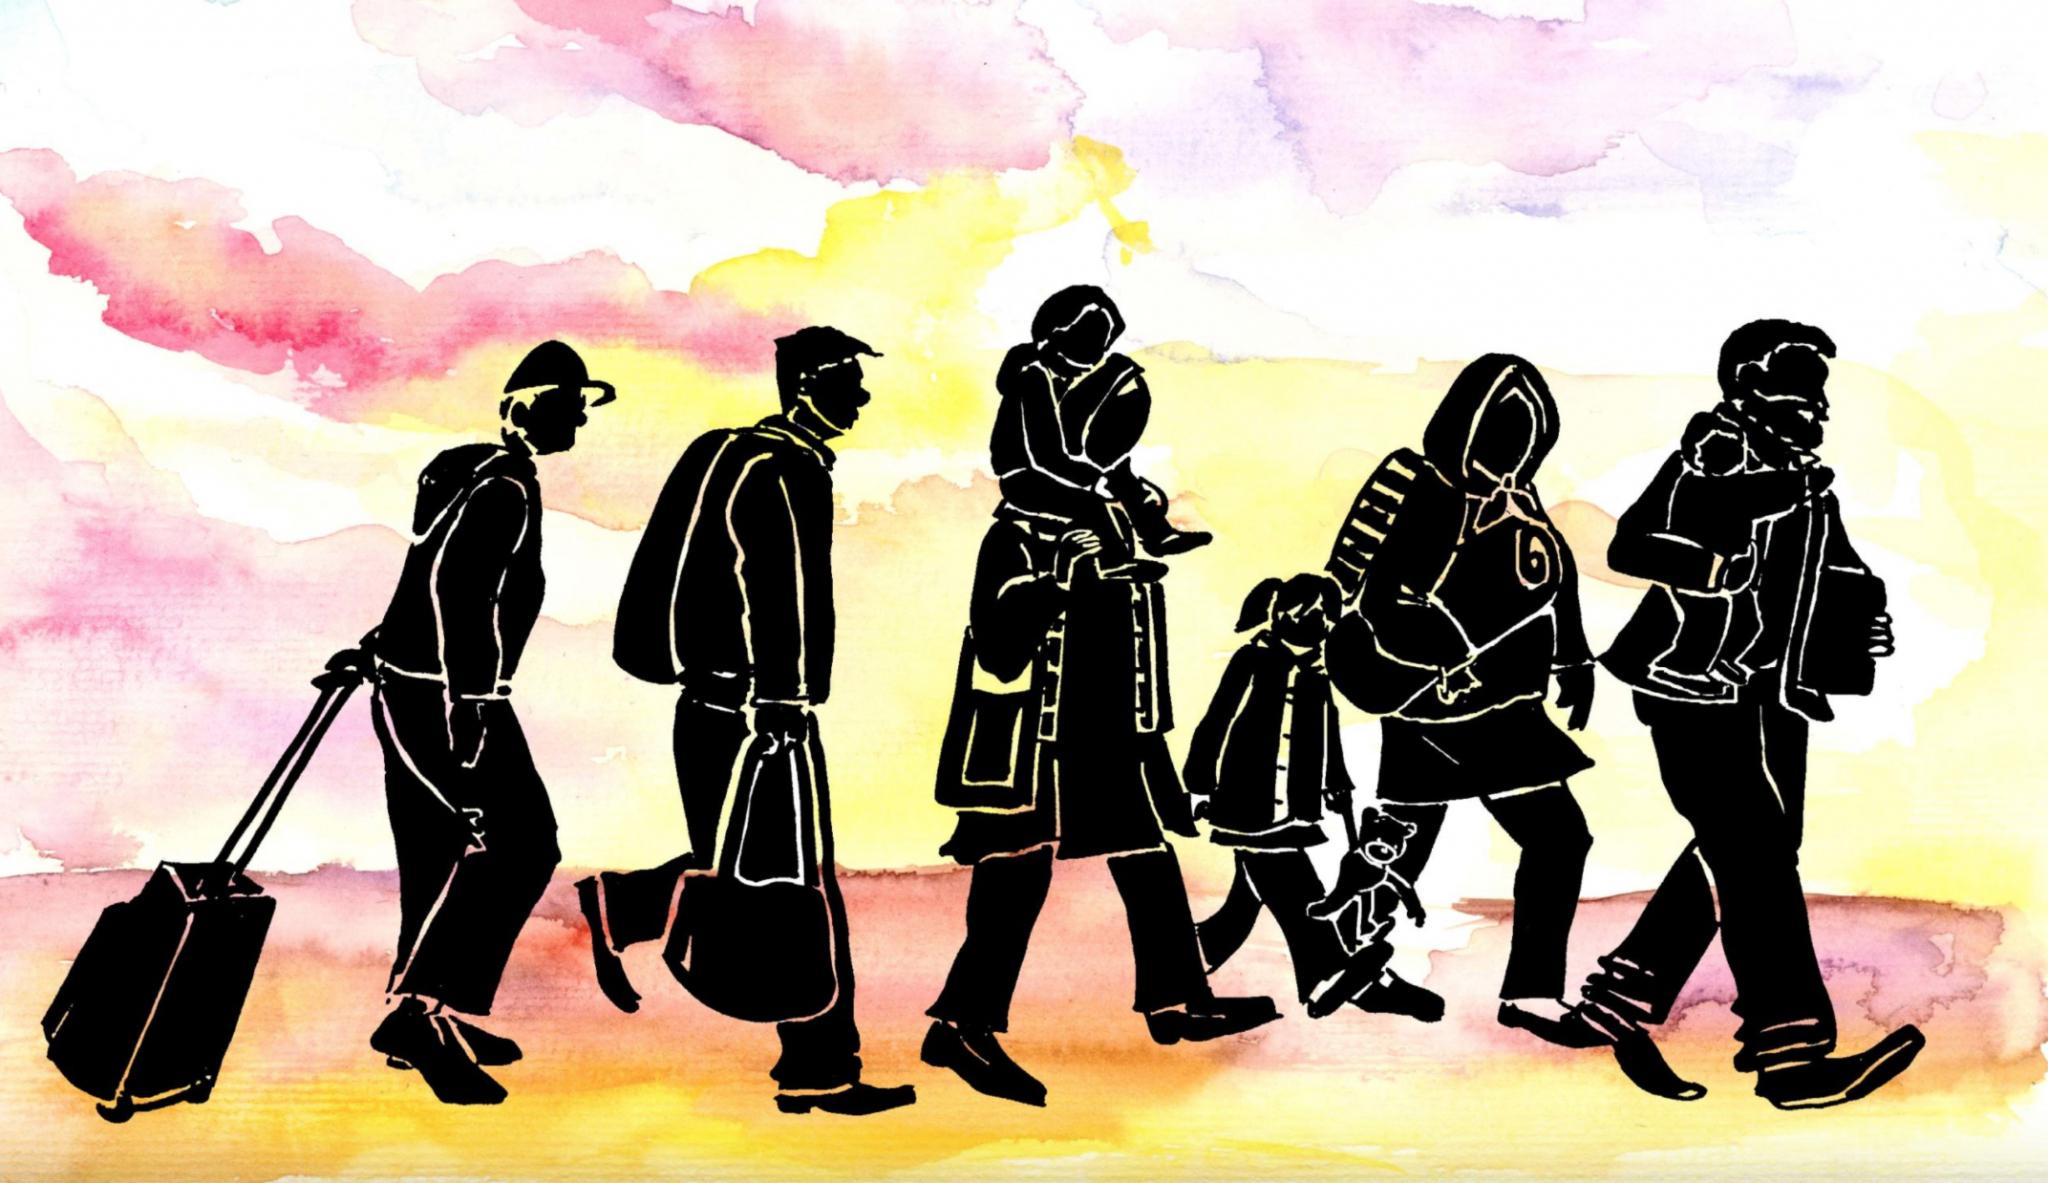 Refugee cartoon